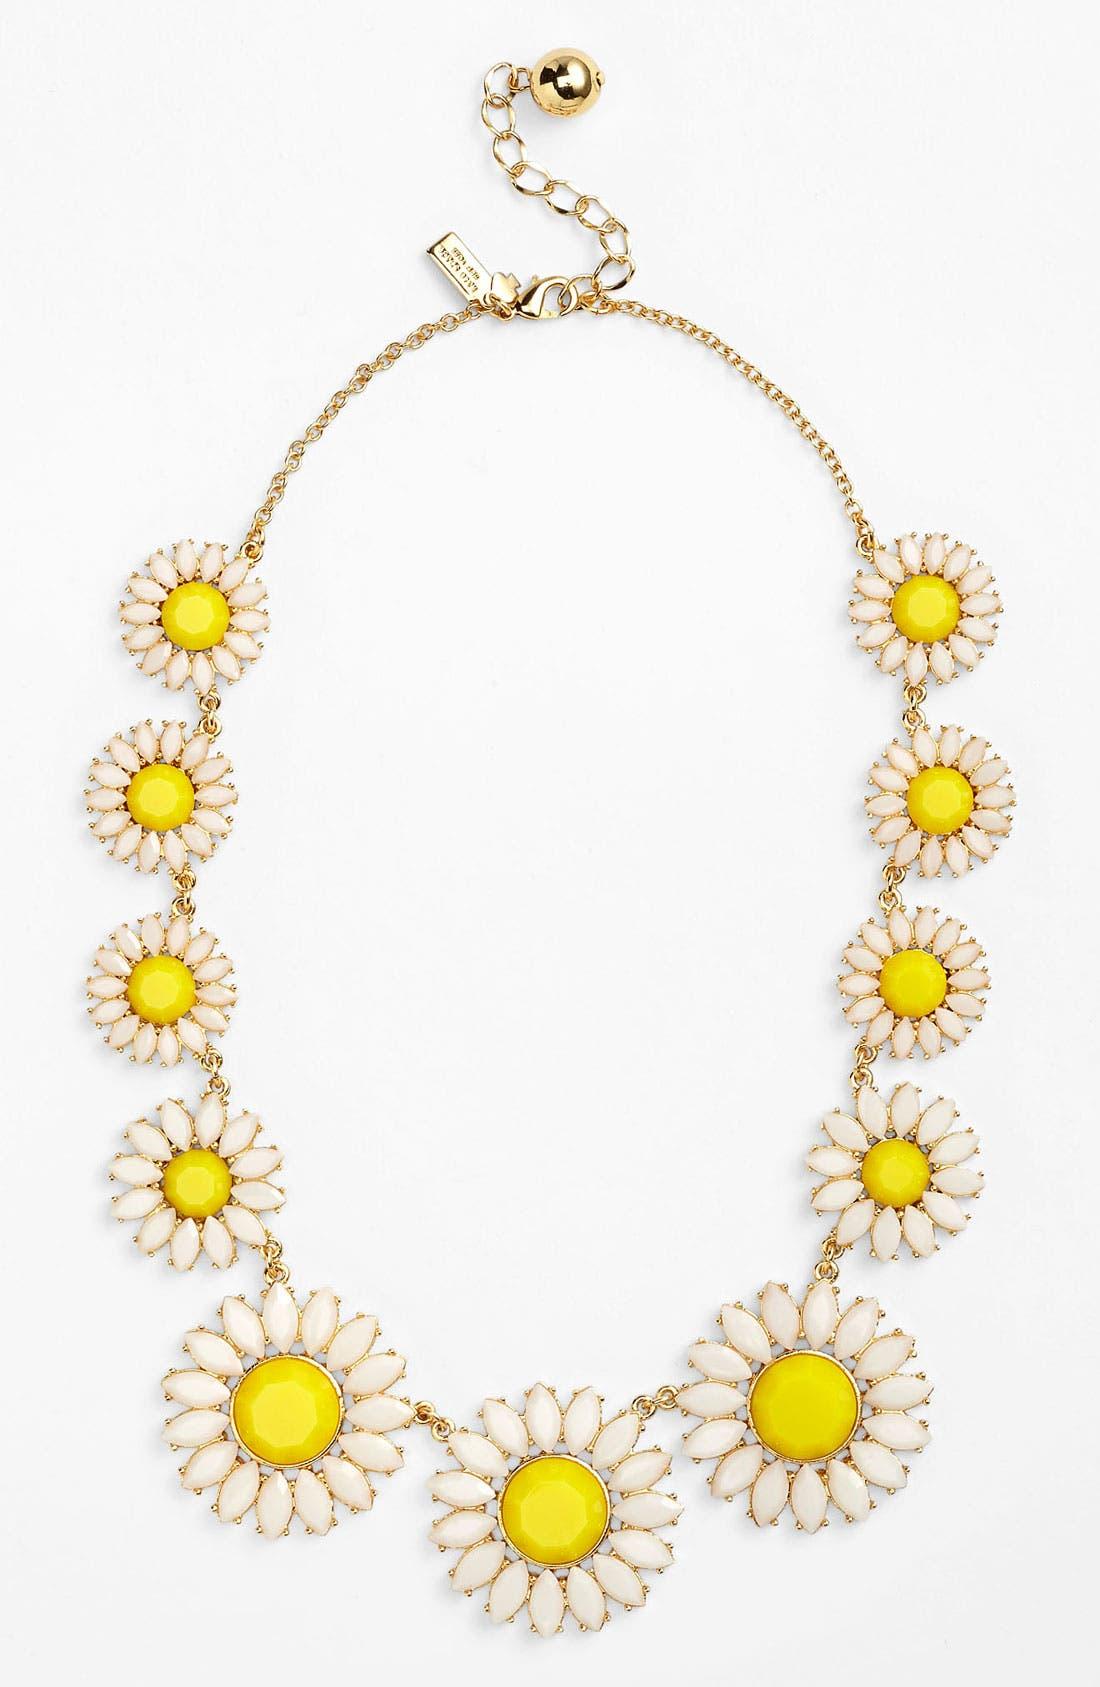 Alternate Image 1 Selected - kate spade new york 'estate garden' collar necklace